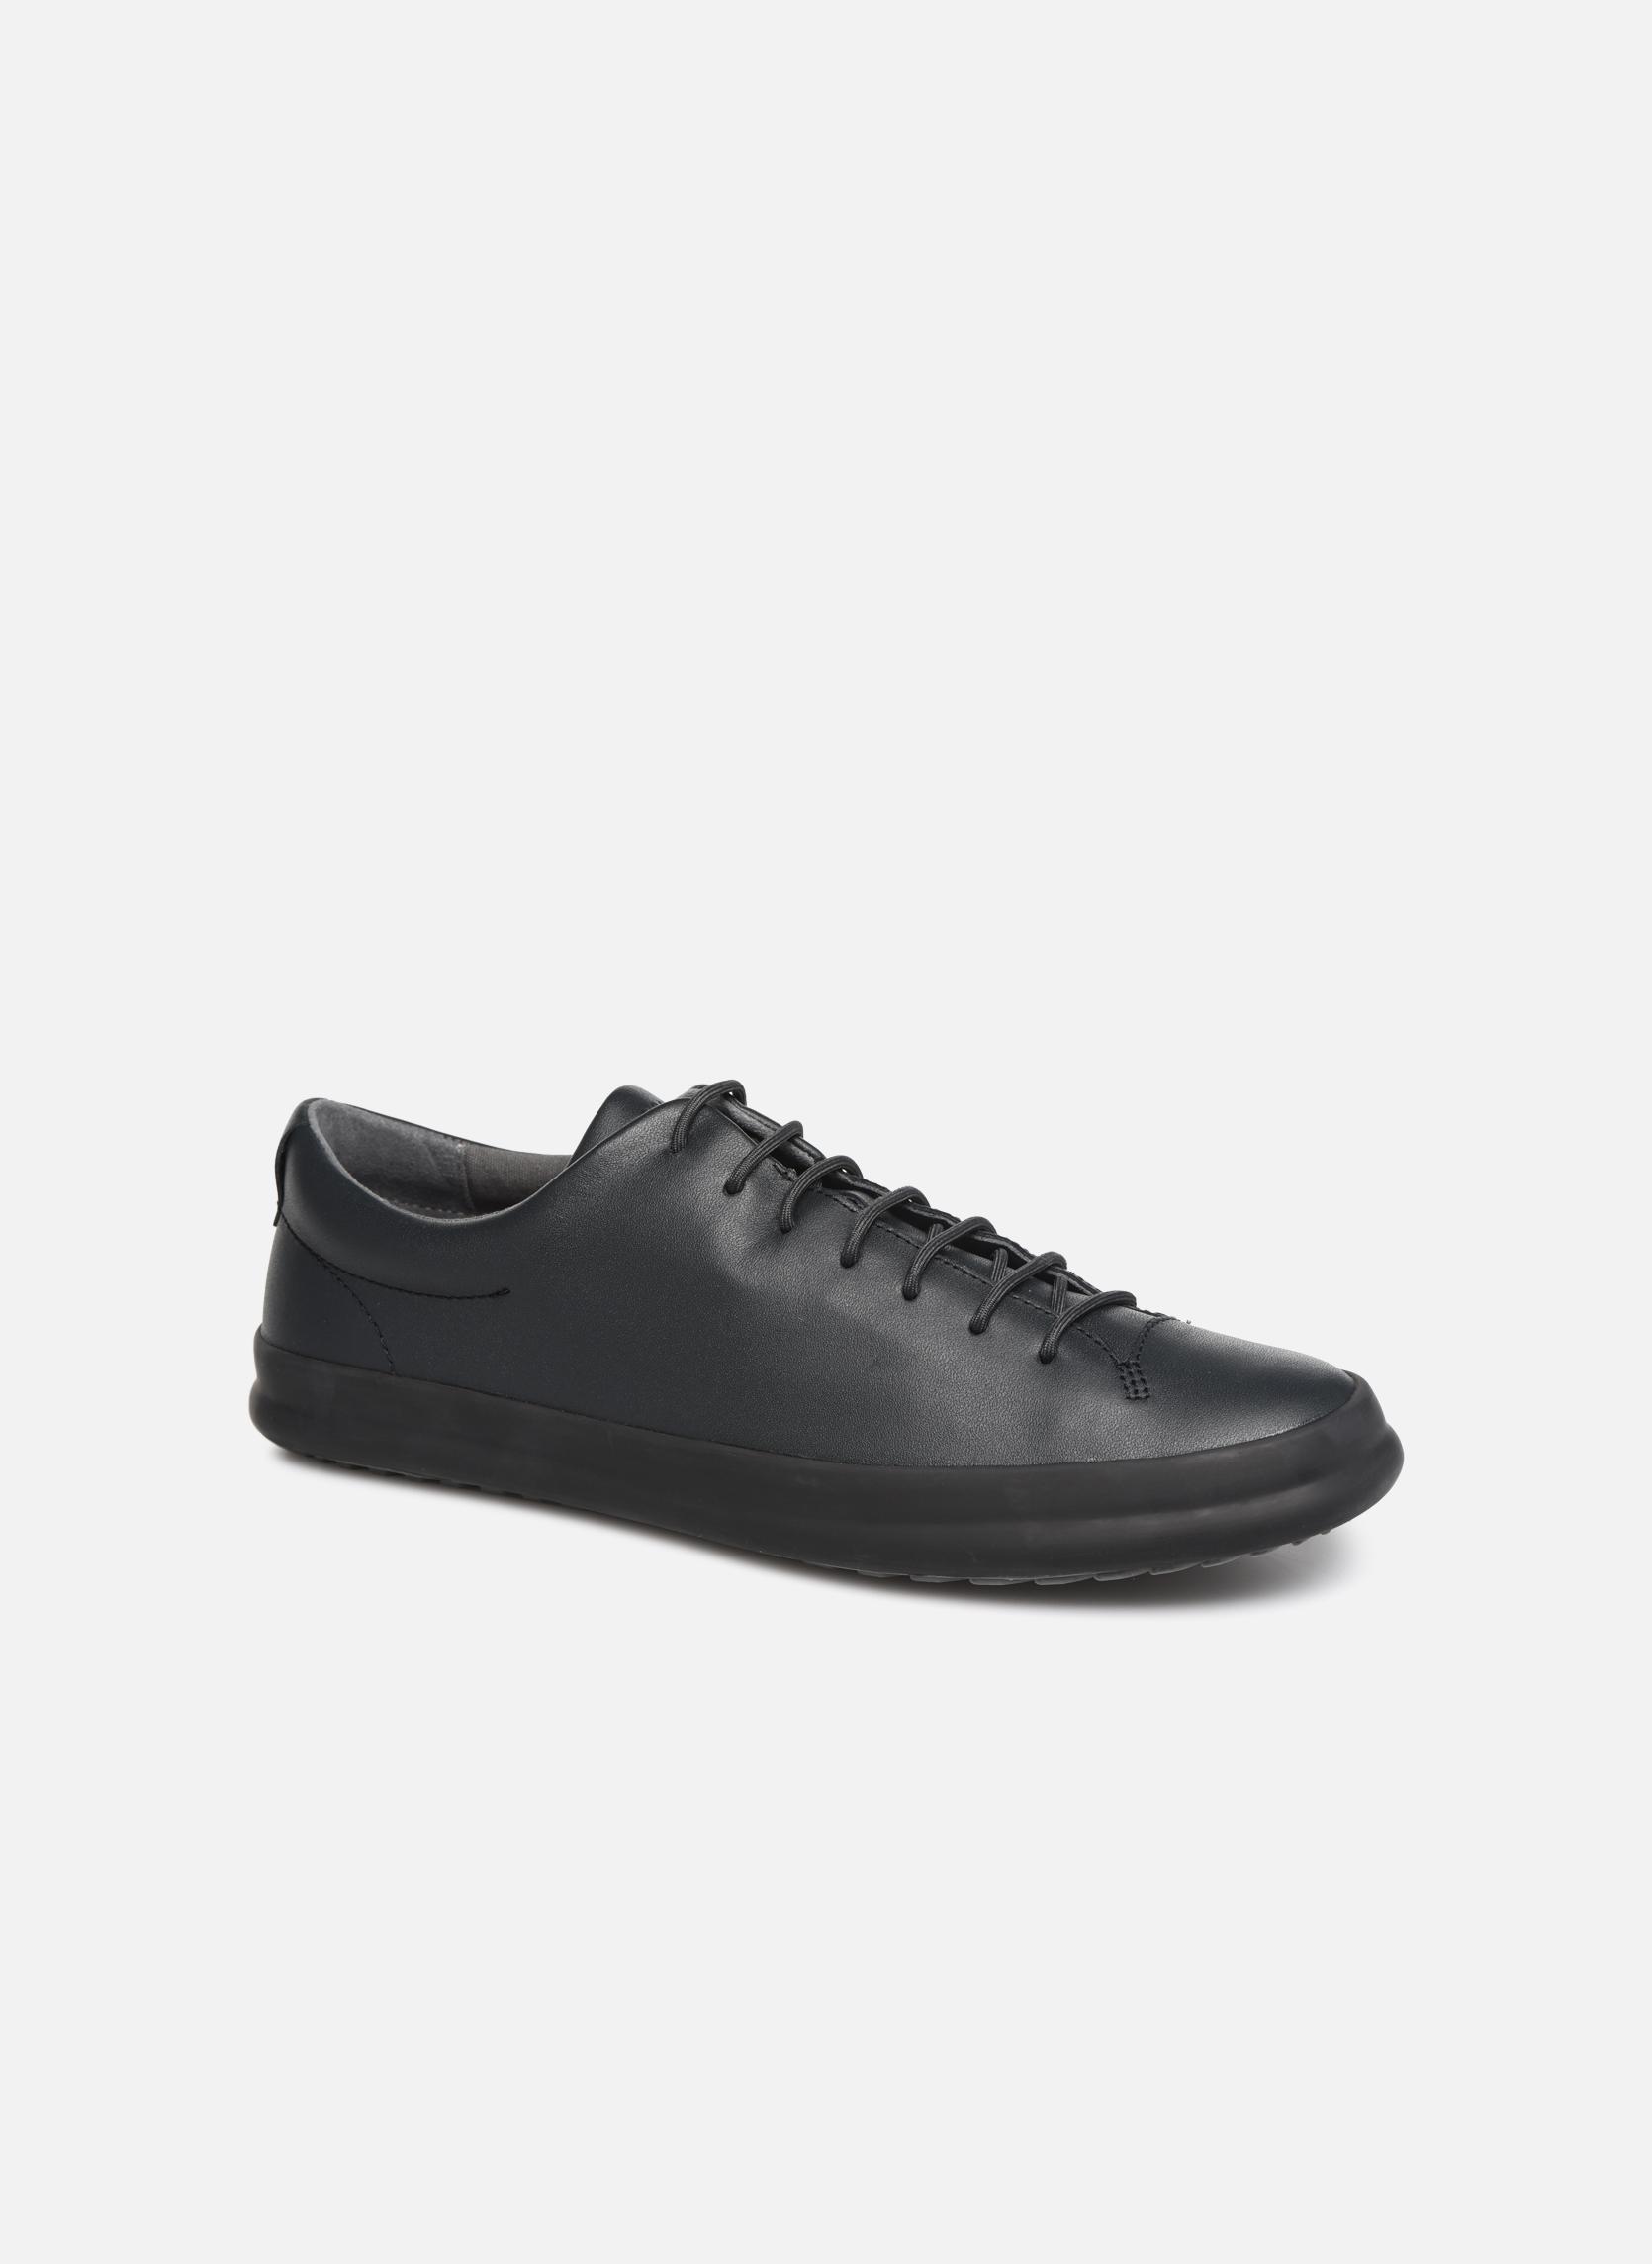 be989cb44bd sneakers Camper PISTA K100251-003 - SchoenenTamTam.nl